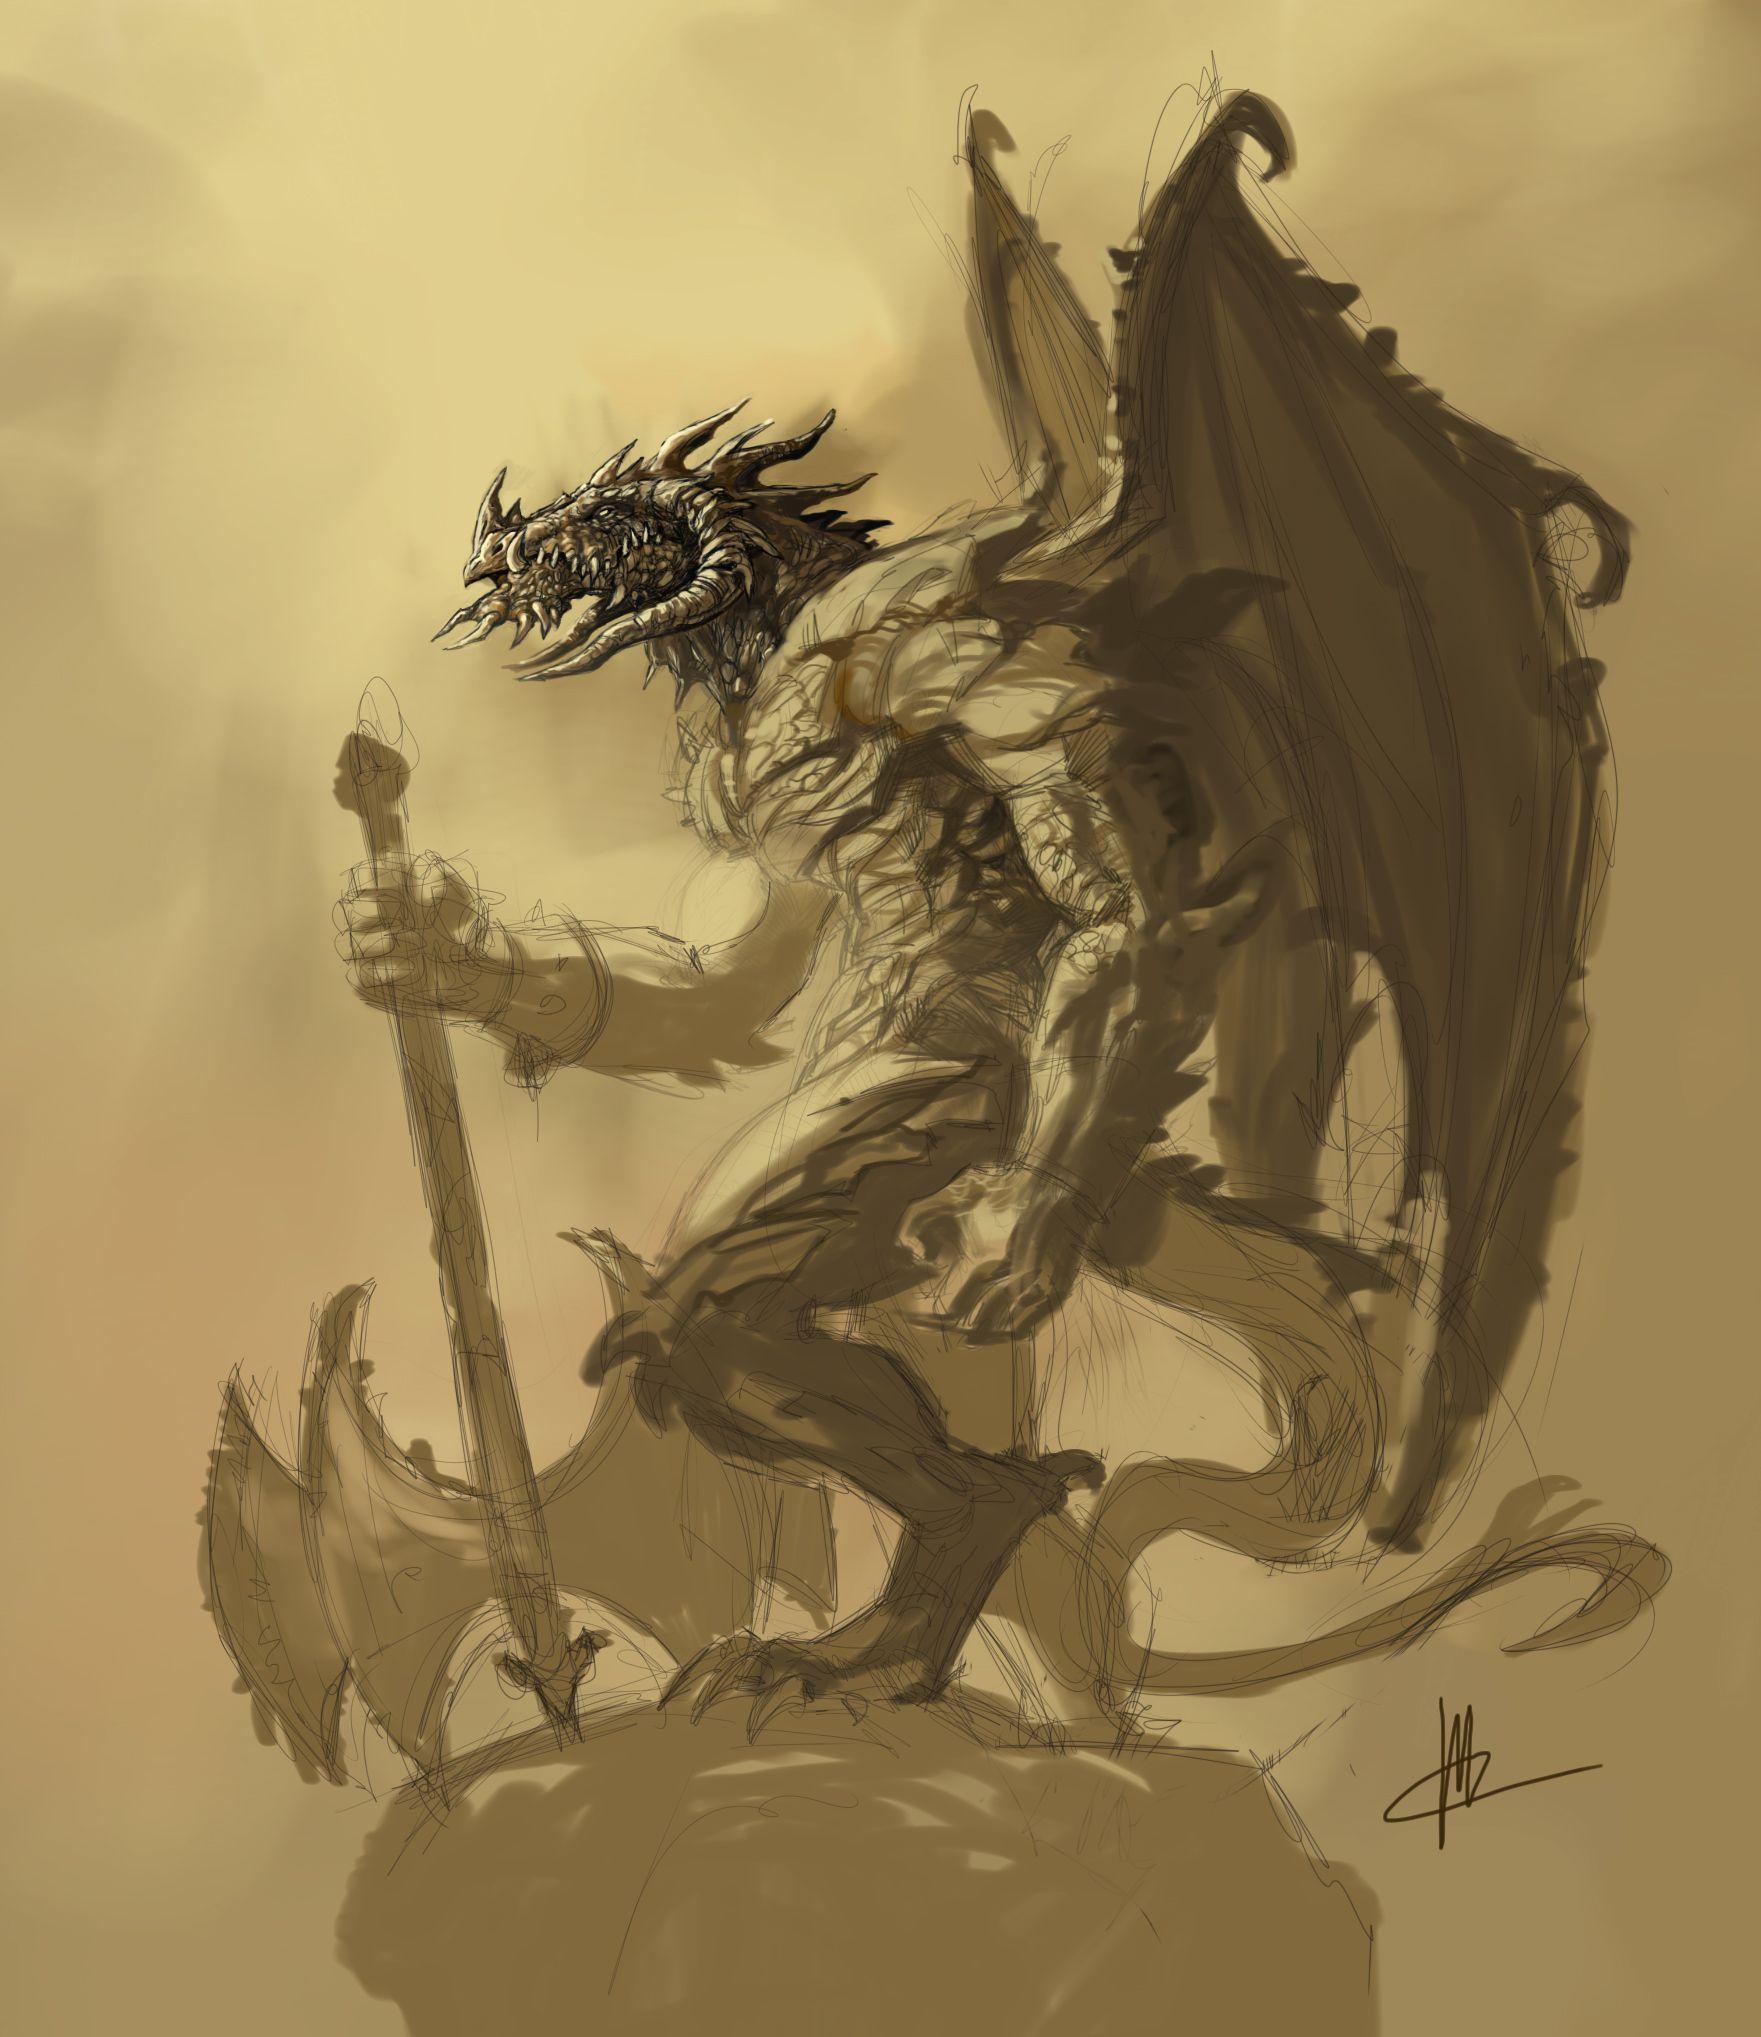 Green dragon humanoid